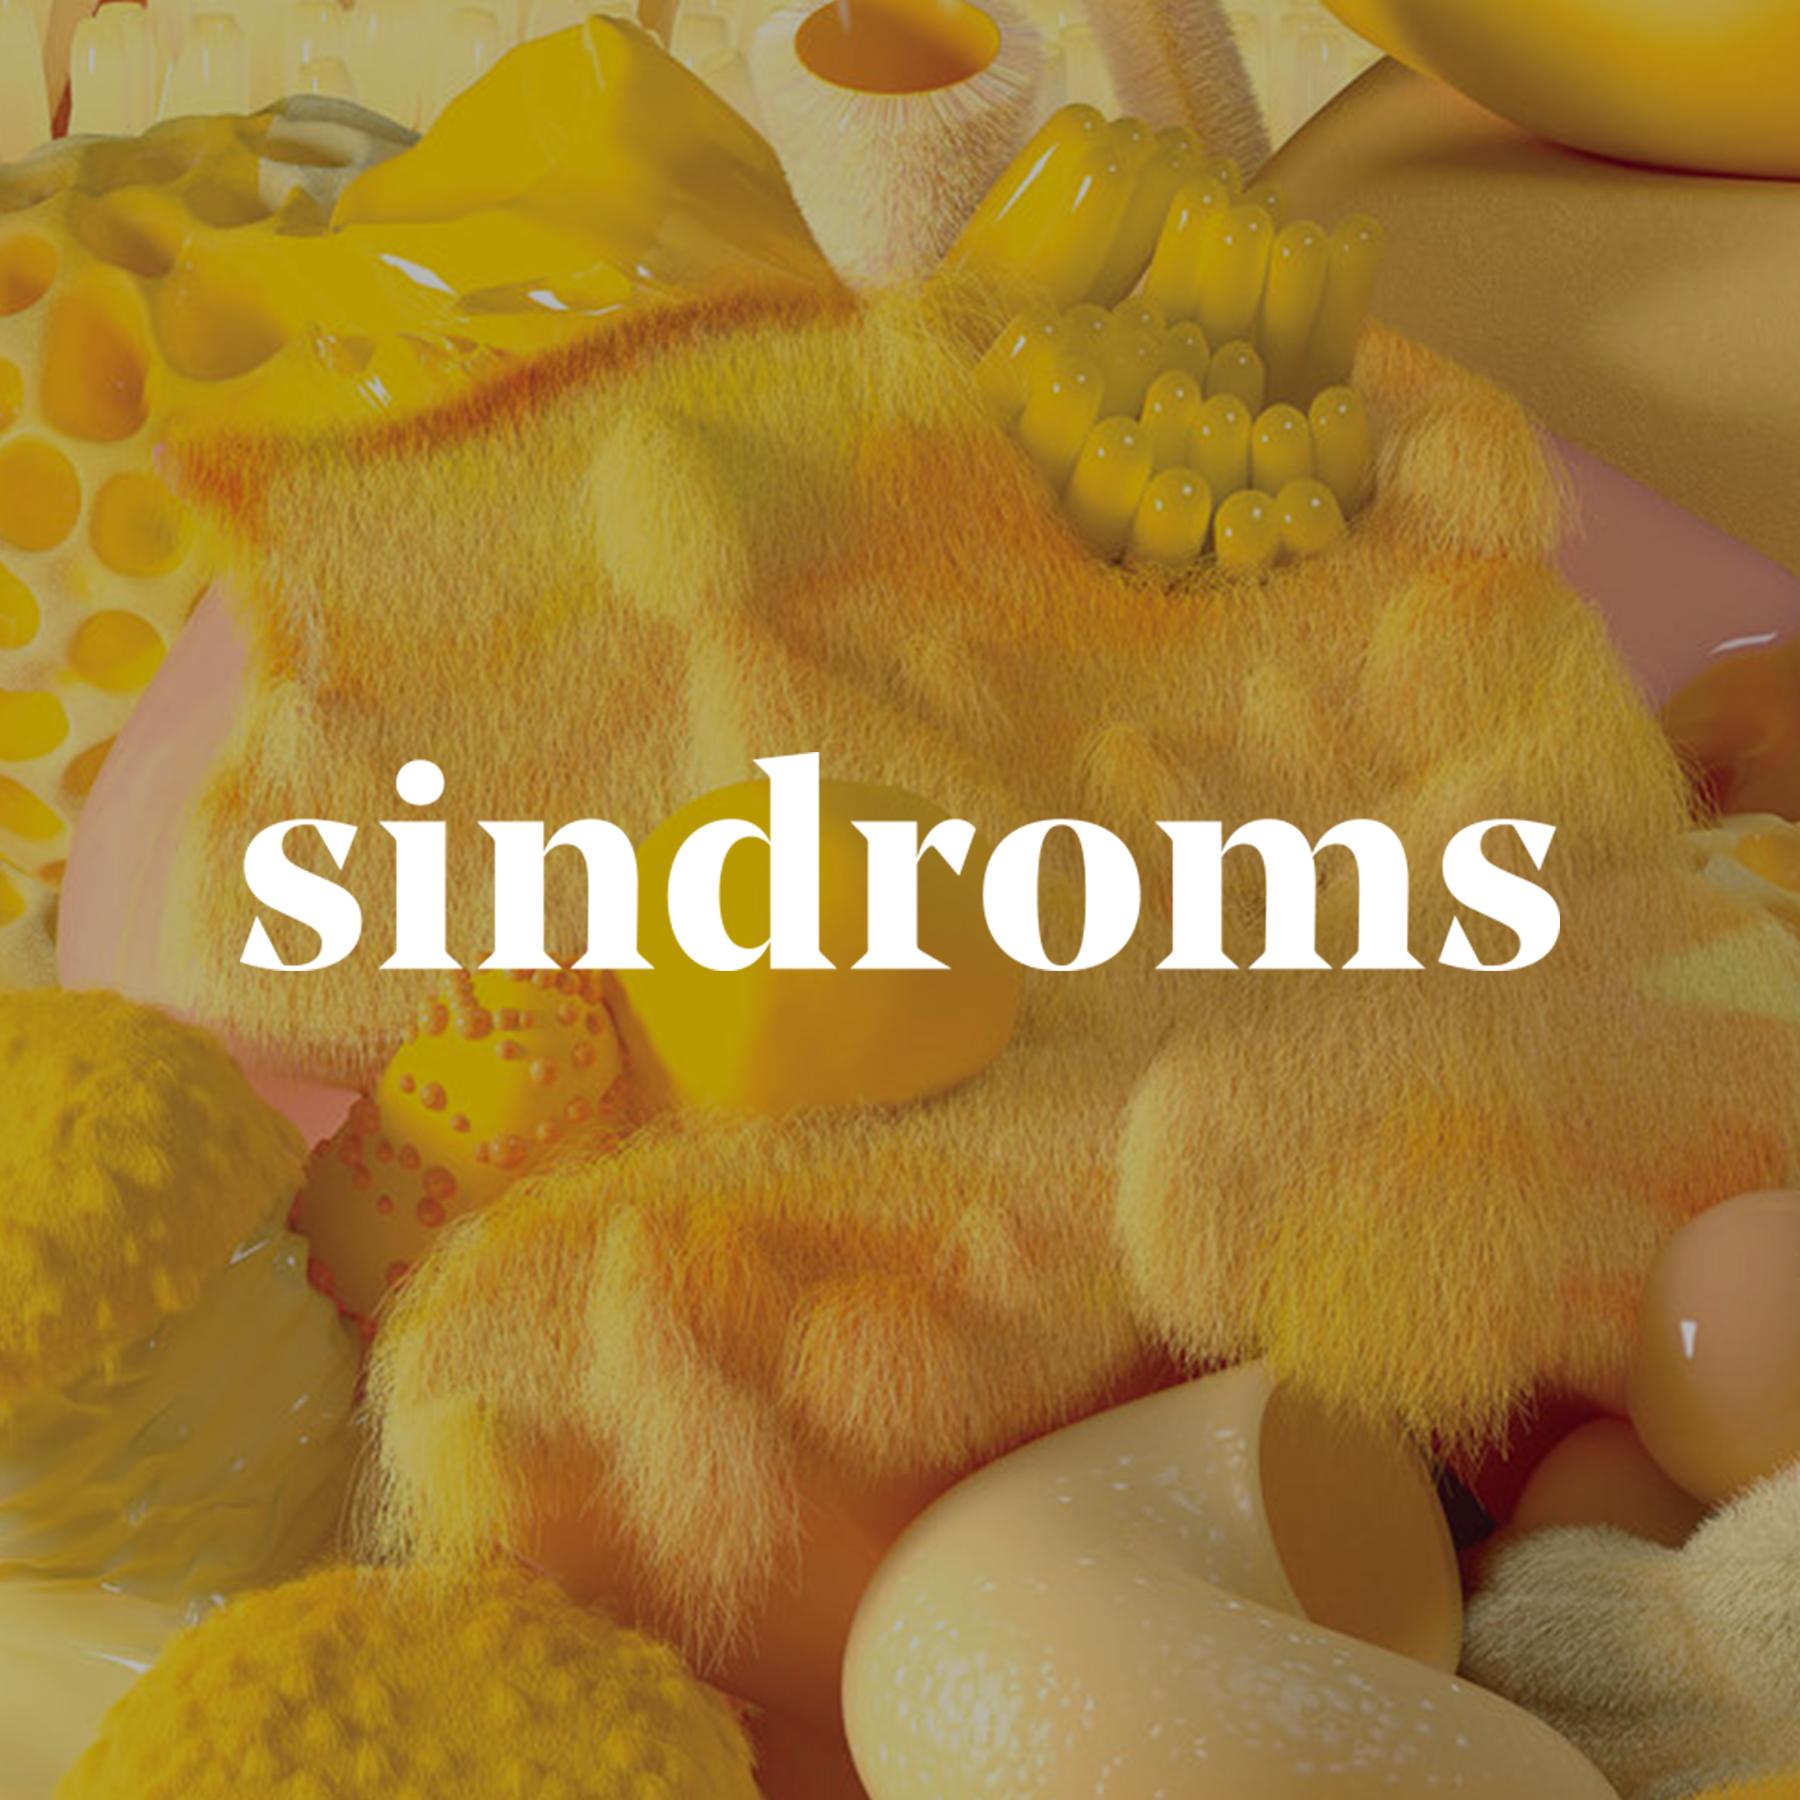 sindroms.jpg